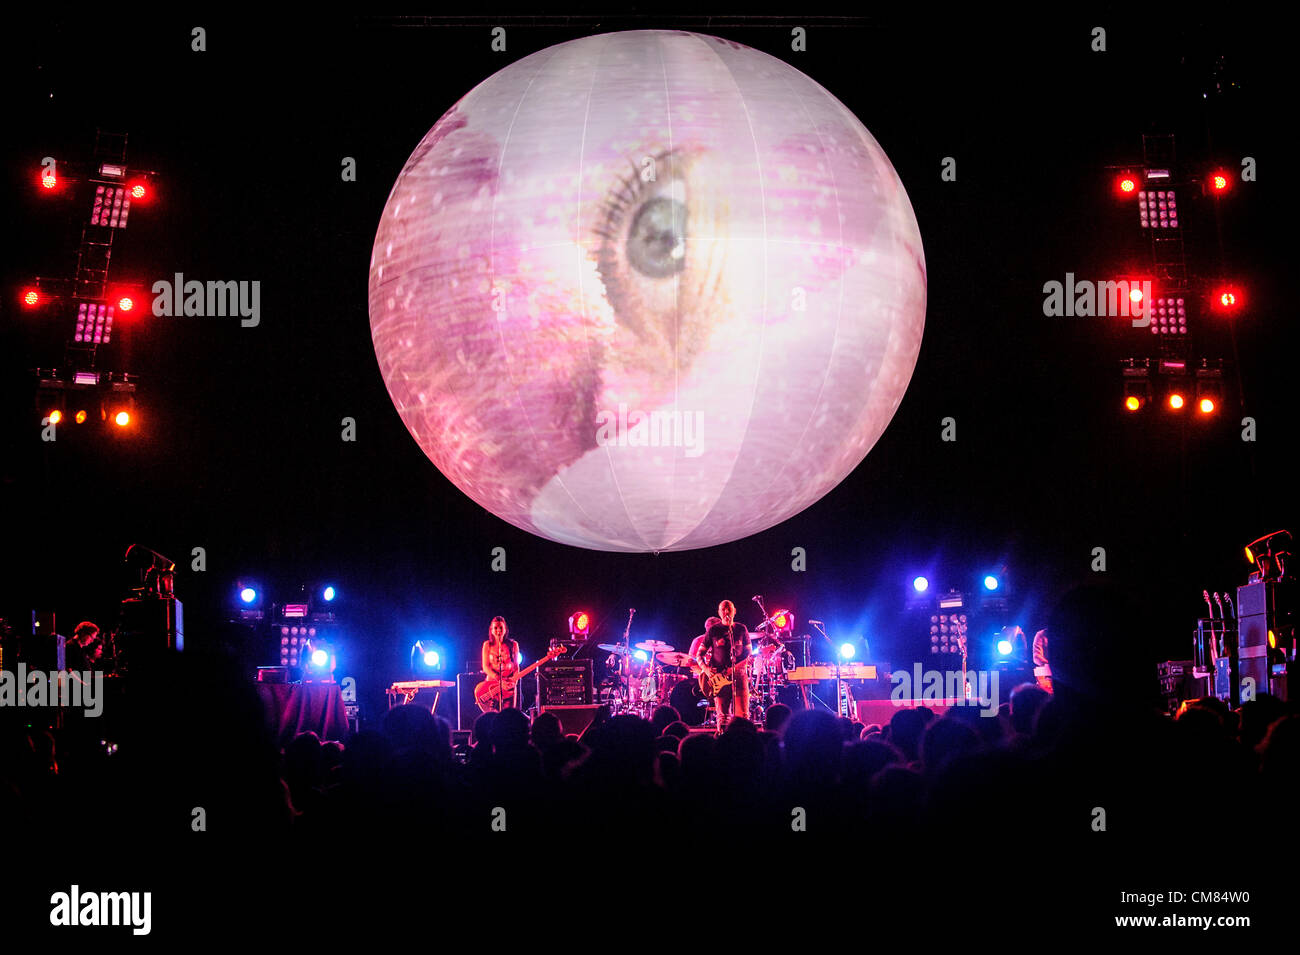 Oct. 25, 2012 - Toronto, Ontario, Canada - American alternative rock band Smashing Pumpkins perform at Air Canada - Stock Image